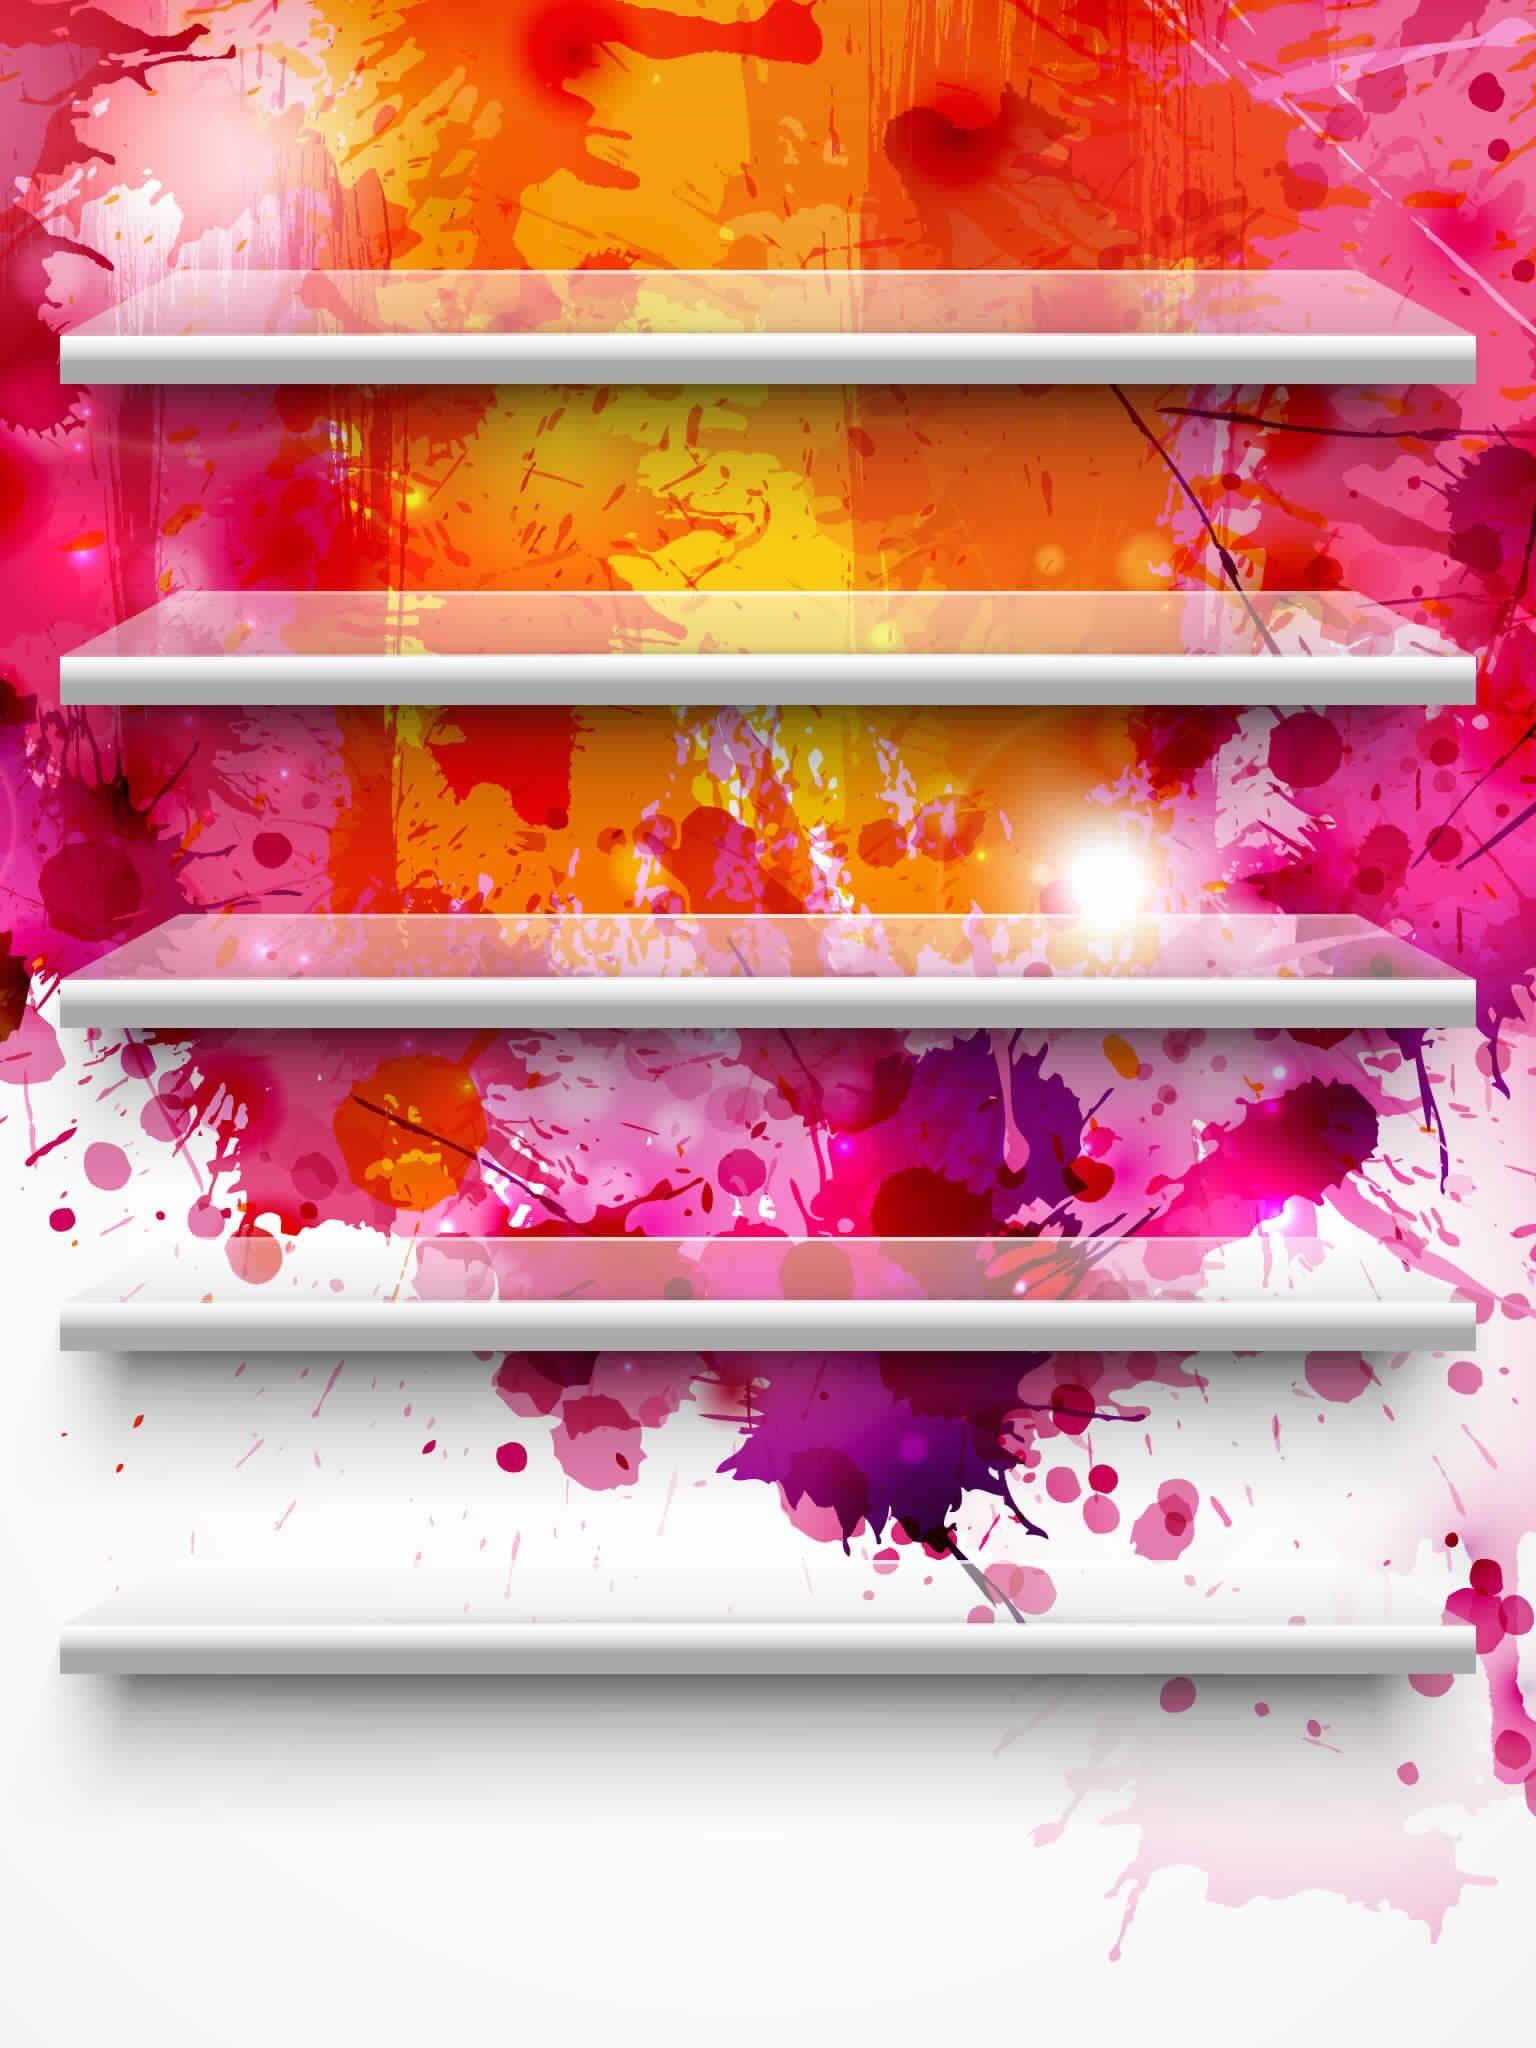 Wallpaper App Shelves Ipad Wallpaper Wallpaper App Wallpaper Shelves